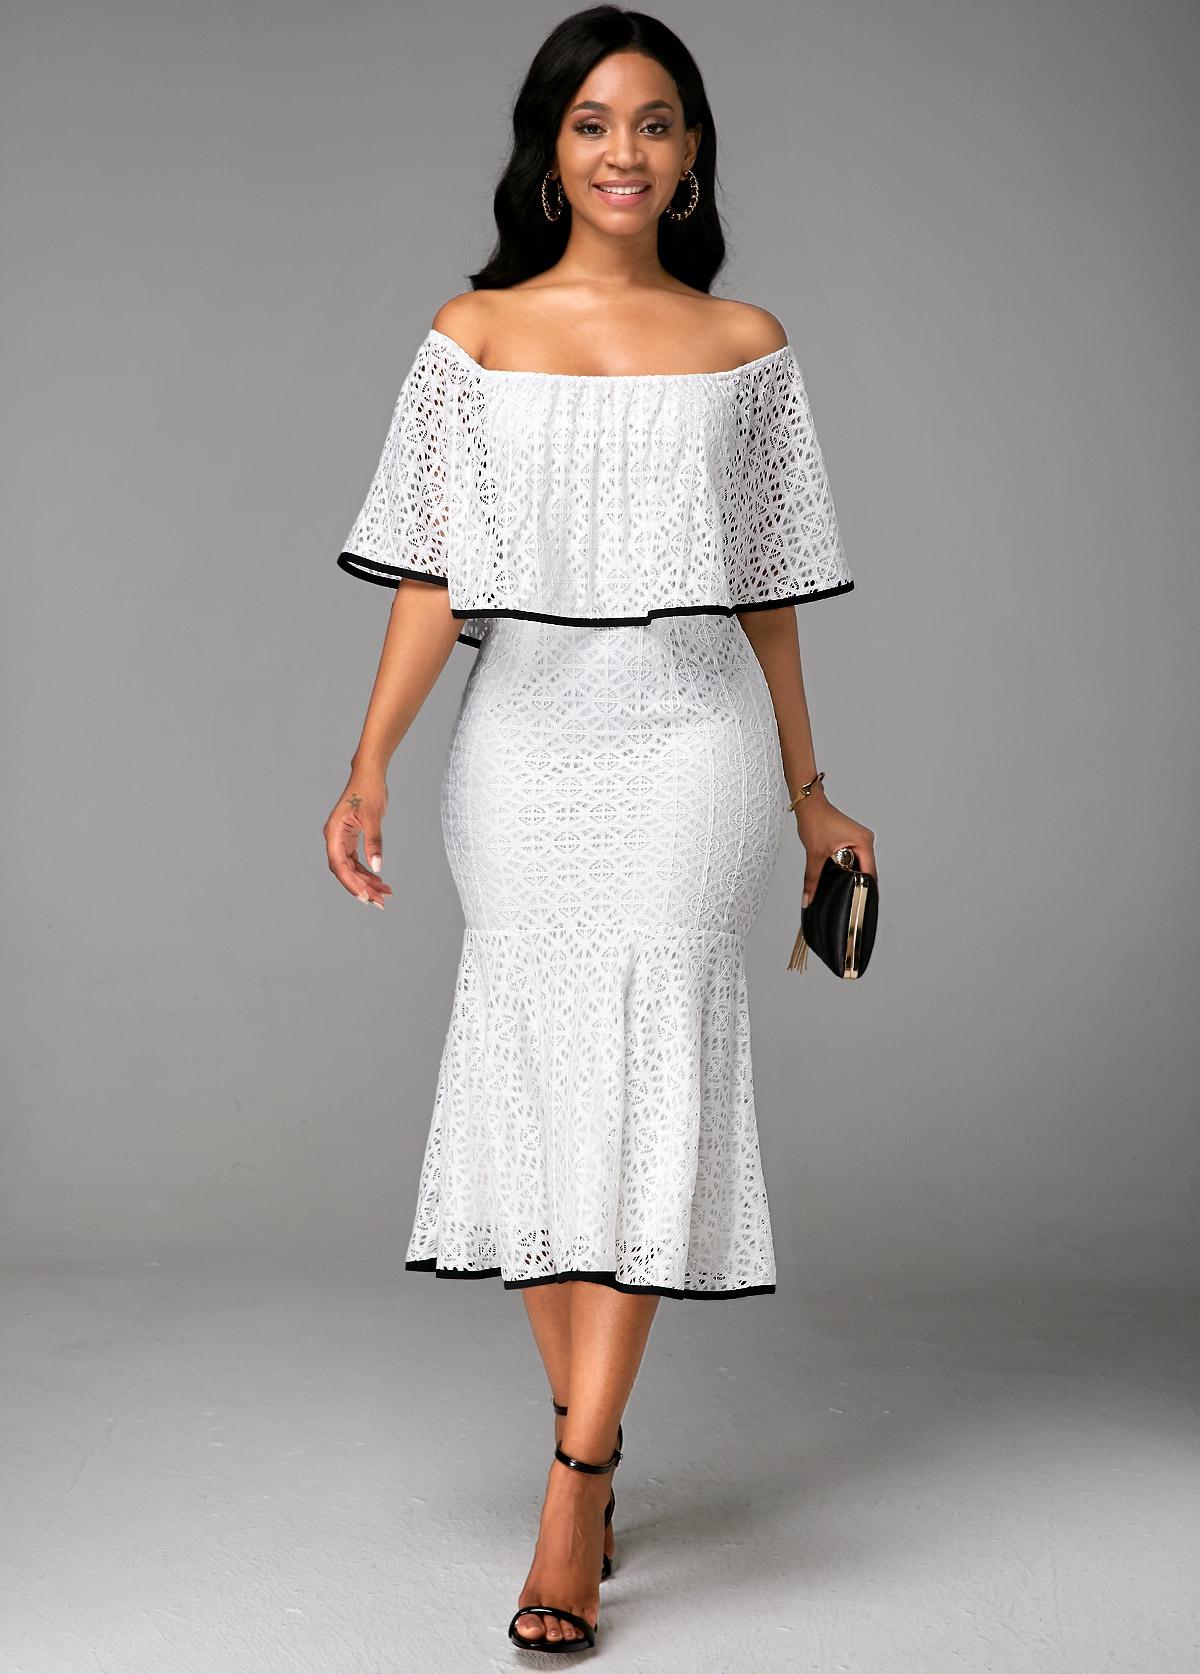 ROTITA White Boat Neck Ruffle Overlay Lace Dress